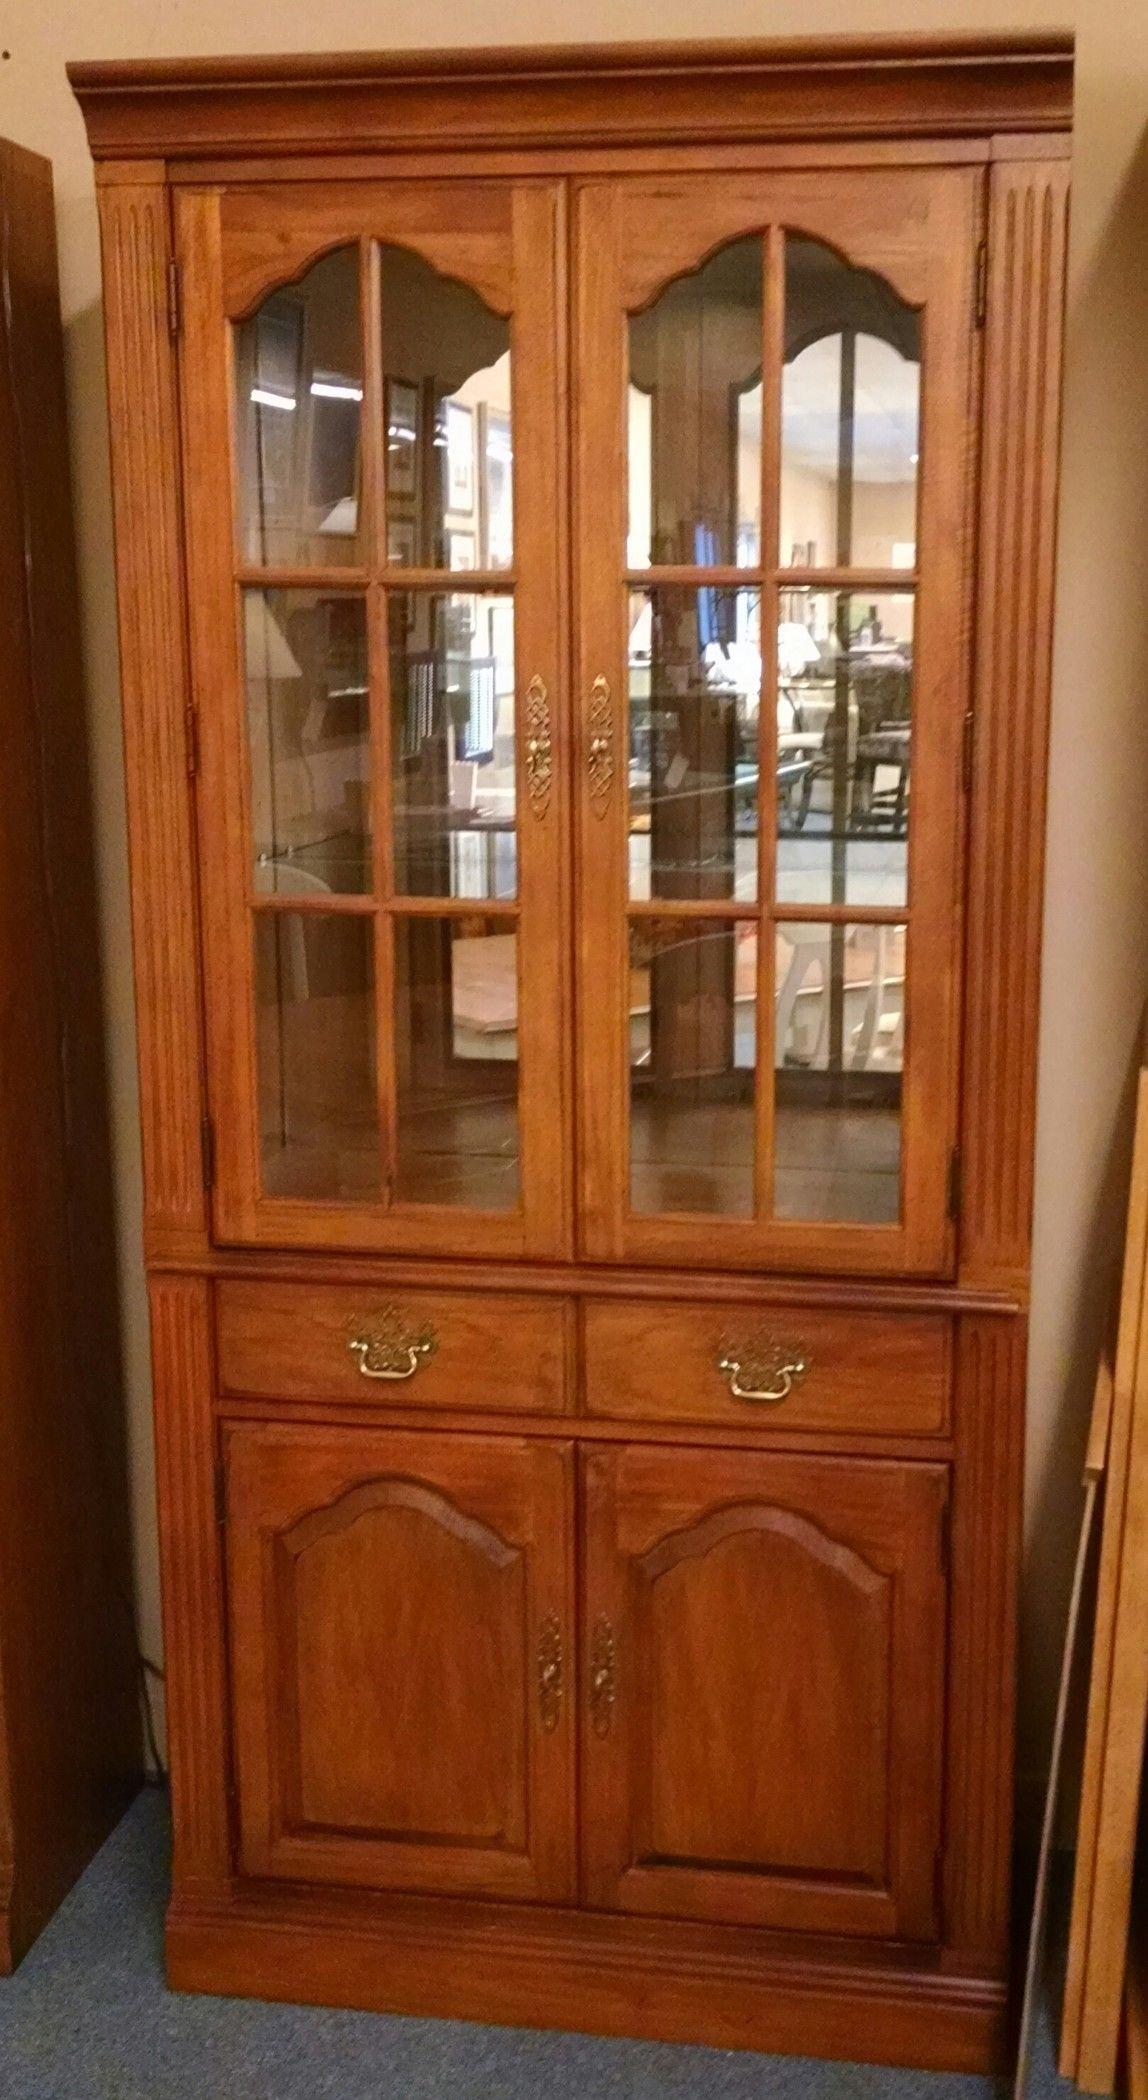 Thomasville 2 Door Cabinet Delmarva Furniture Consignment